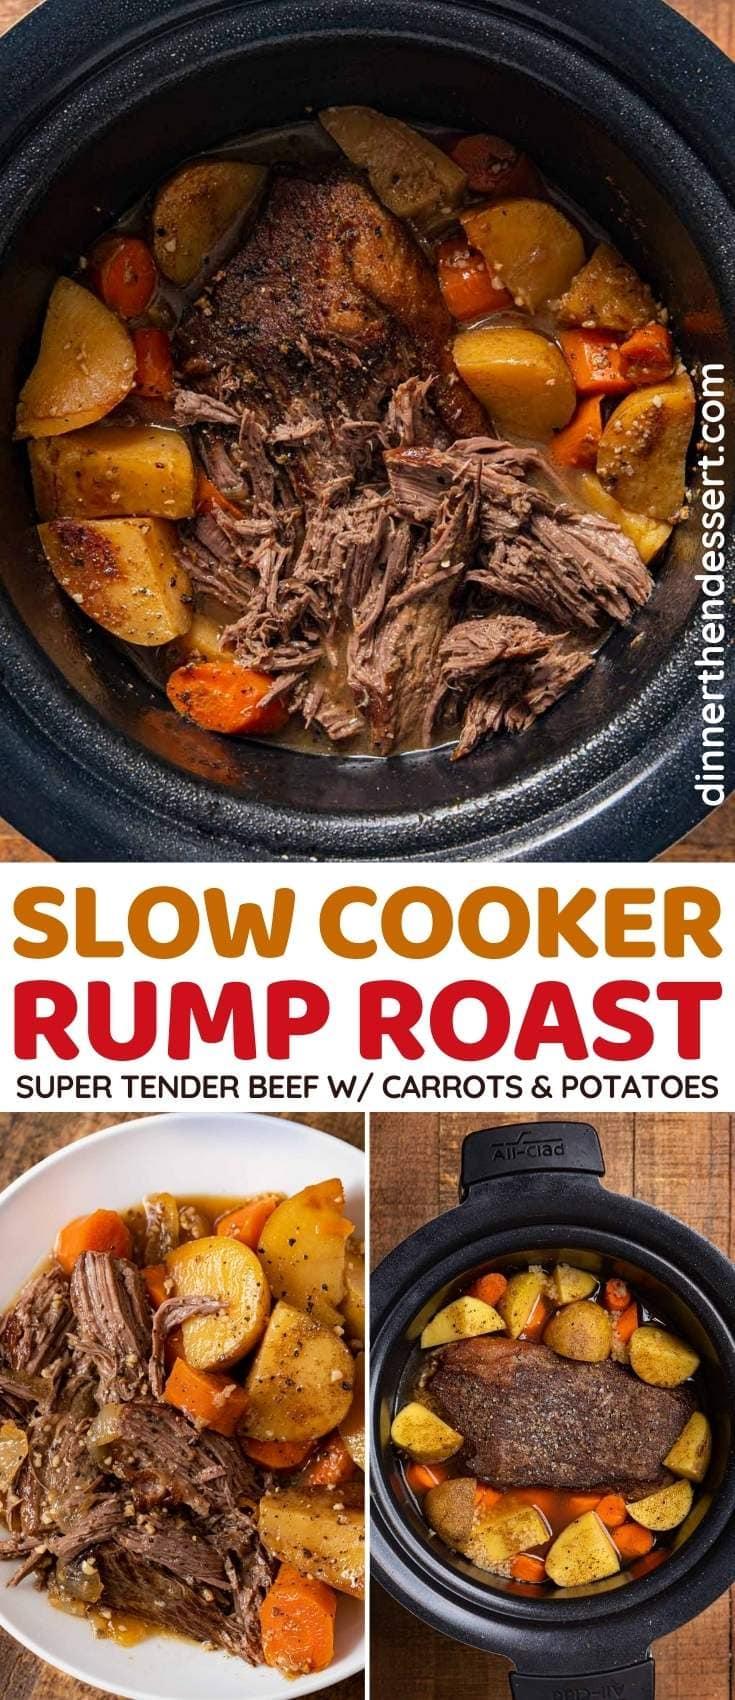 Slow Cooker Rump Roast collage